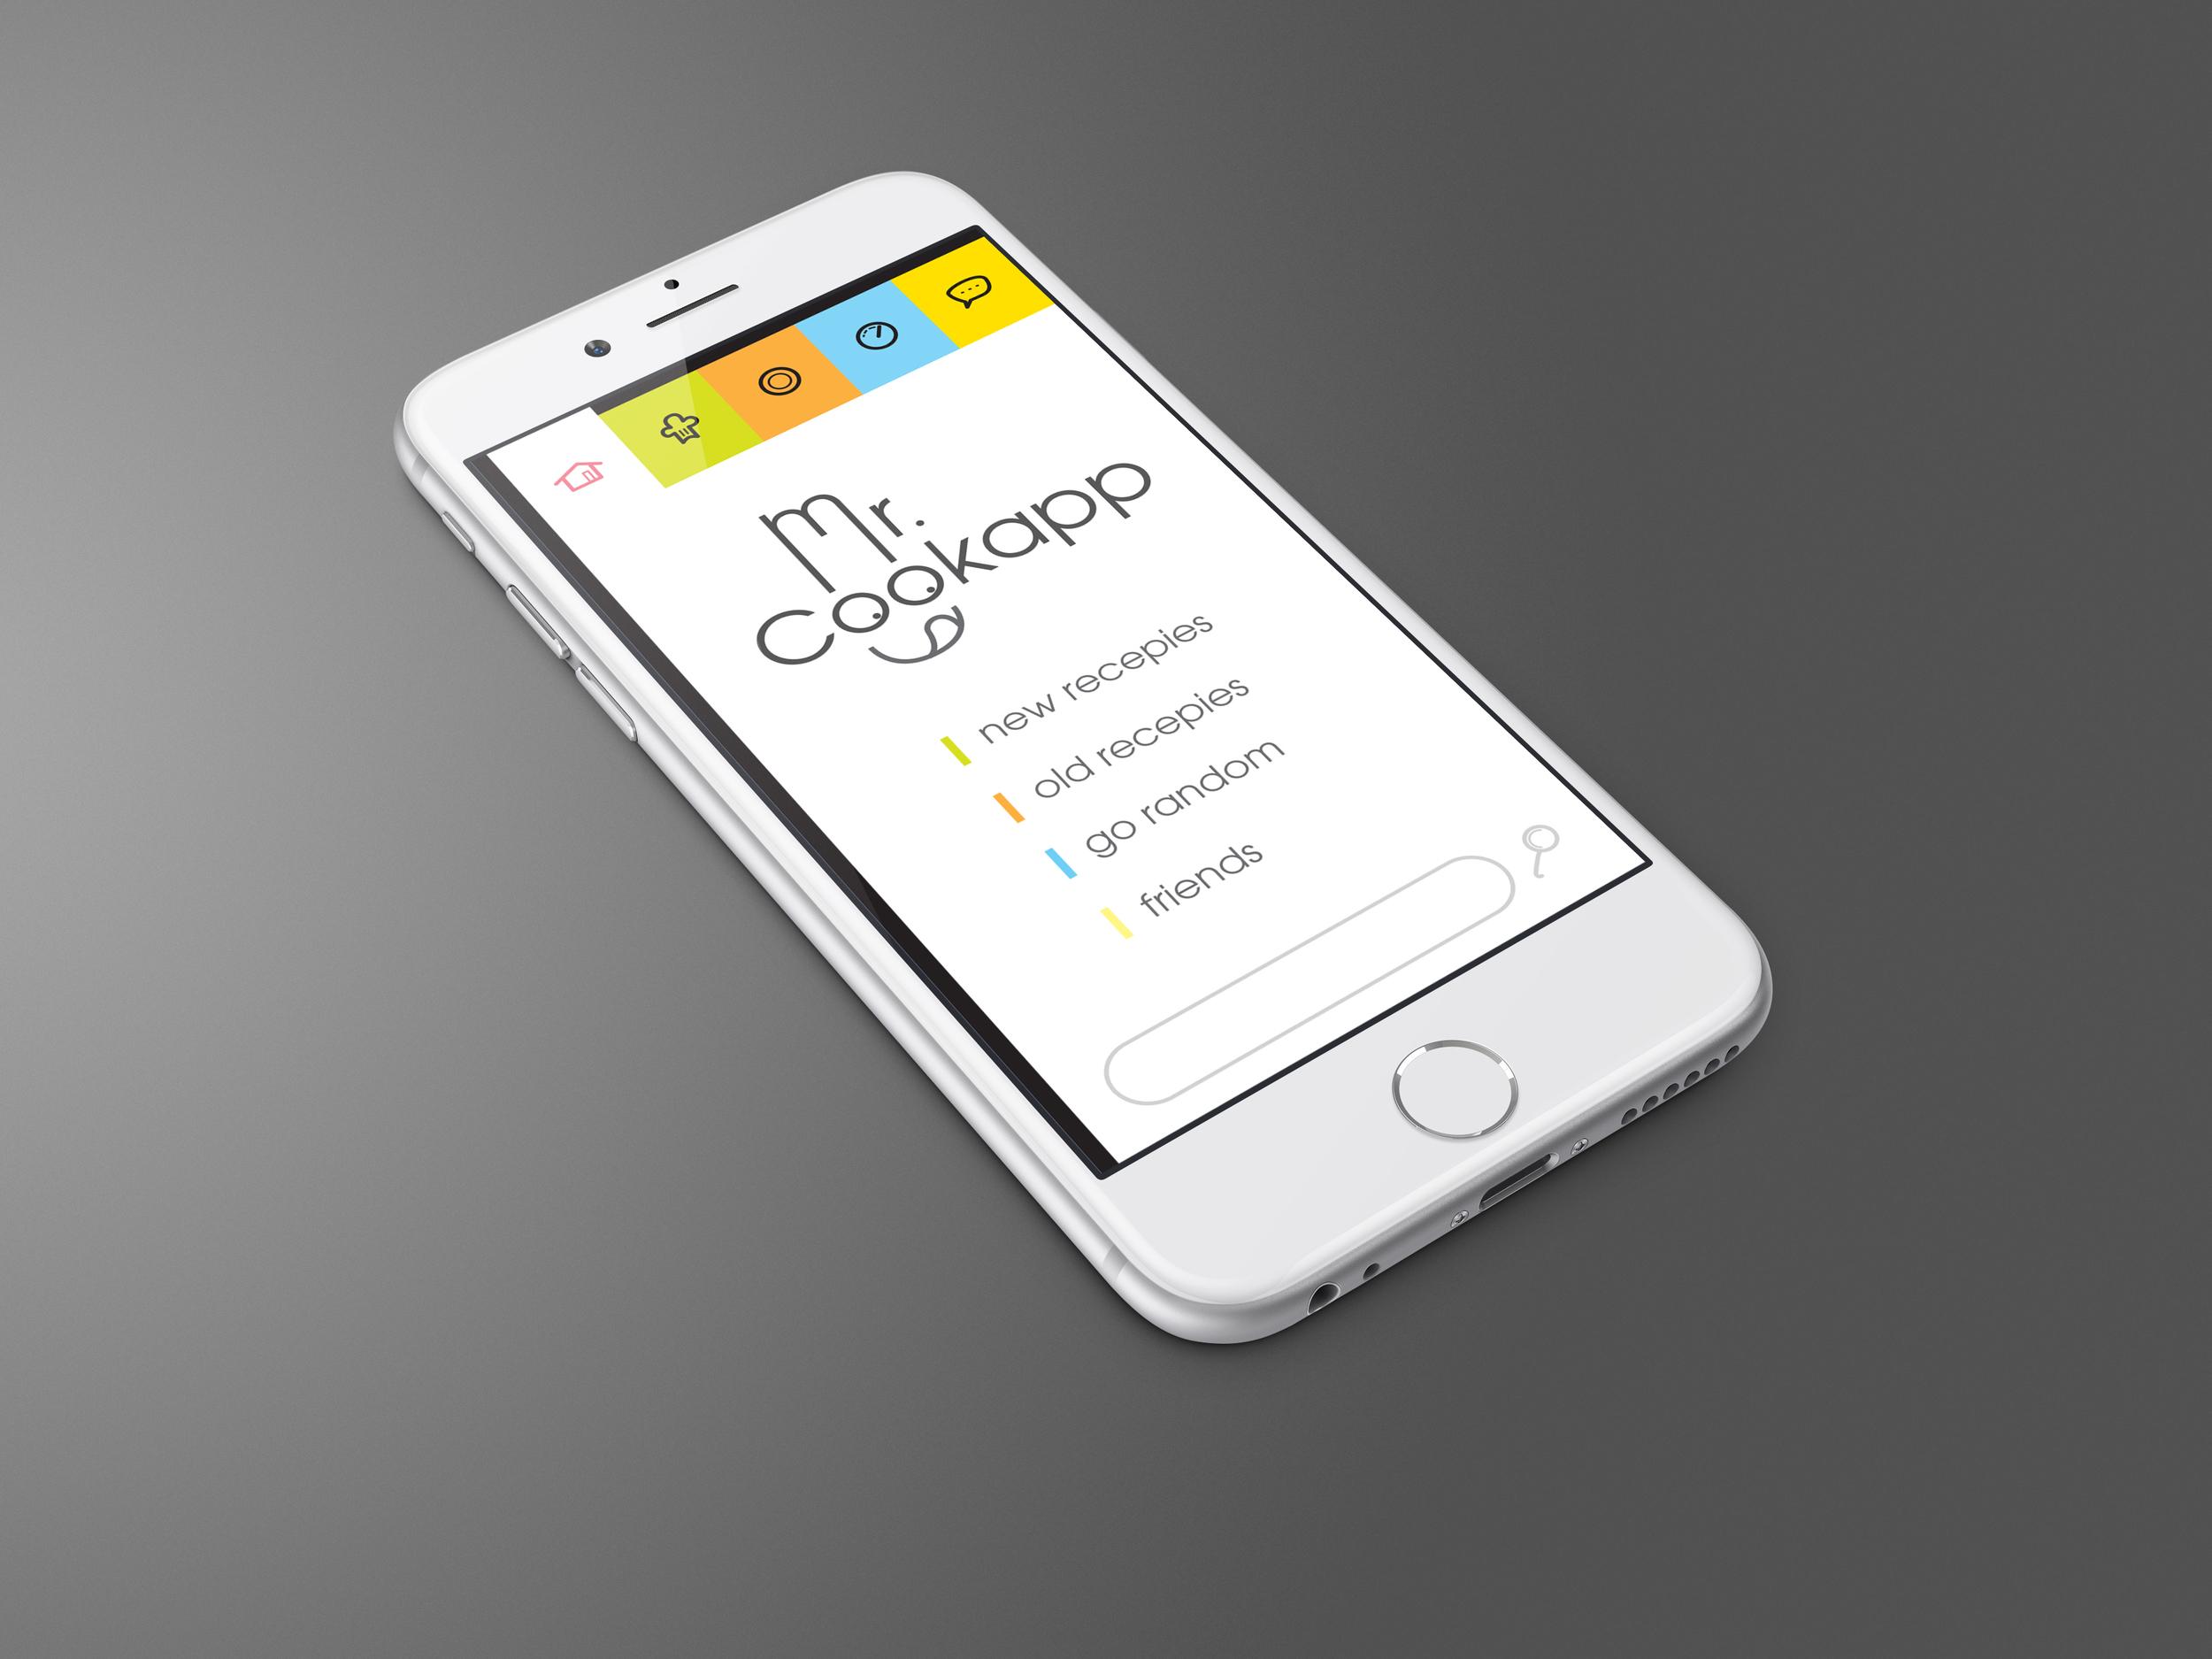 A spec idea for an hands free recipes app